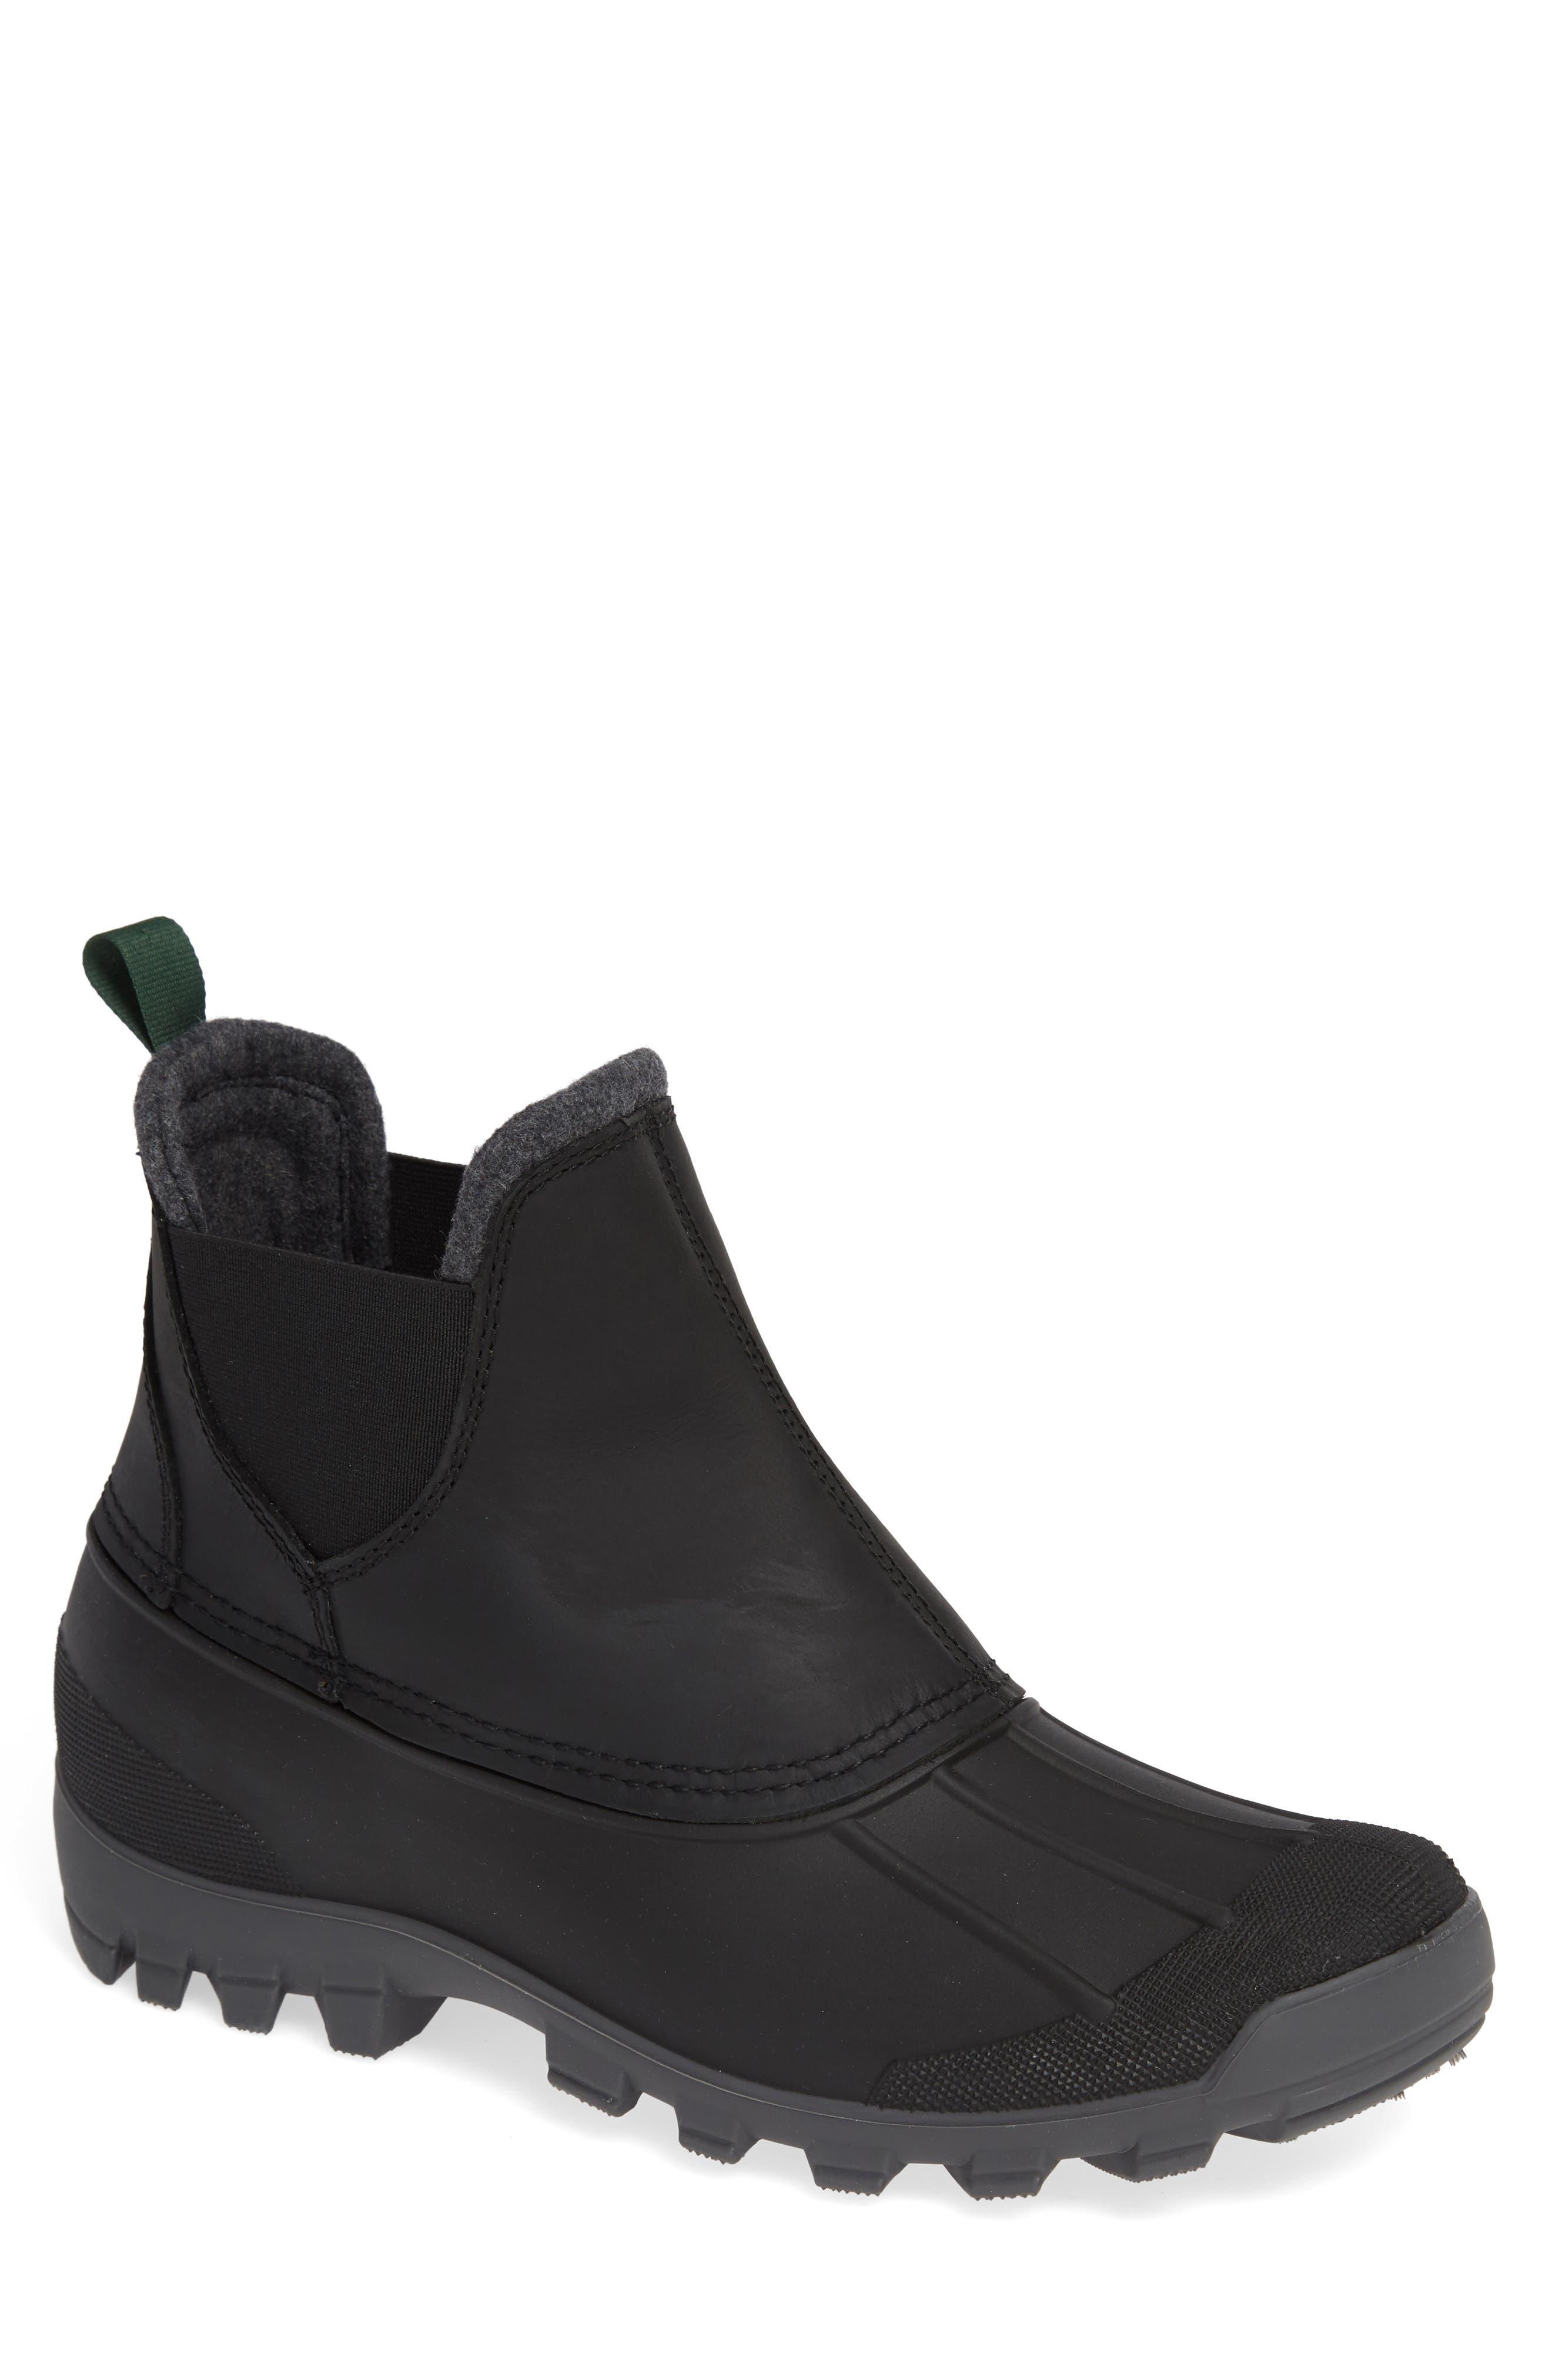 Hudson C Waterproof Winter Boot,                             Main thumbnail 1, color,                             001